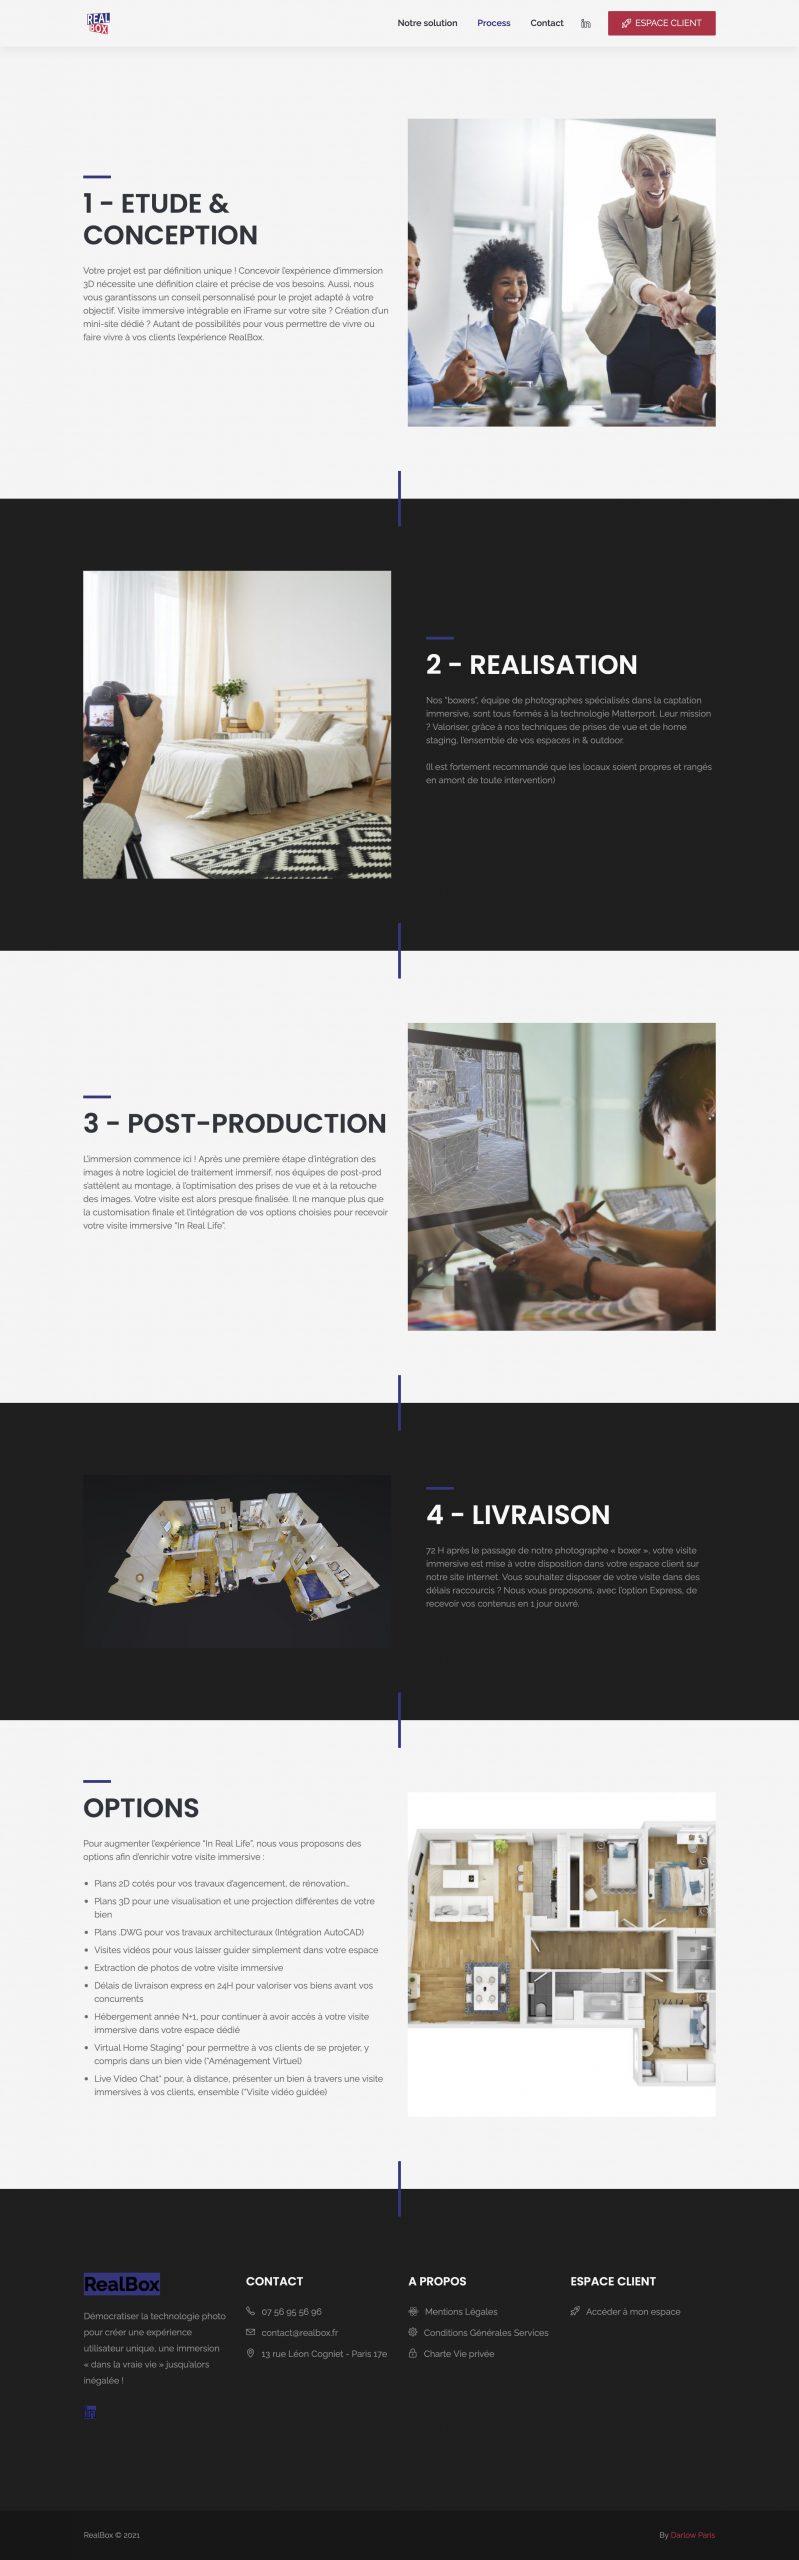 RealBox par Agence Darlow Paris I Agence site web & communication digitale I Paris / NYC / Dubaï